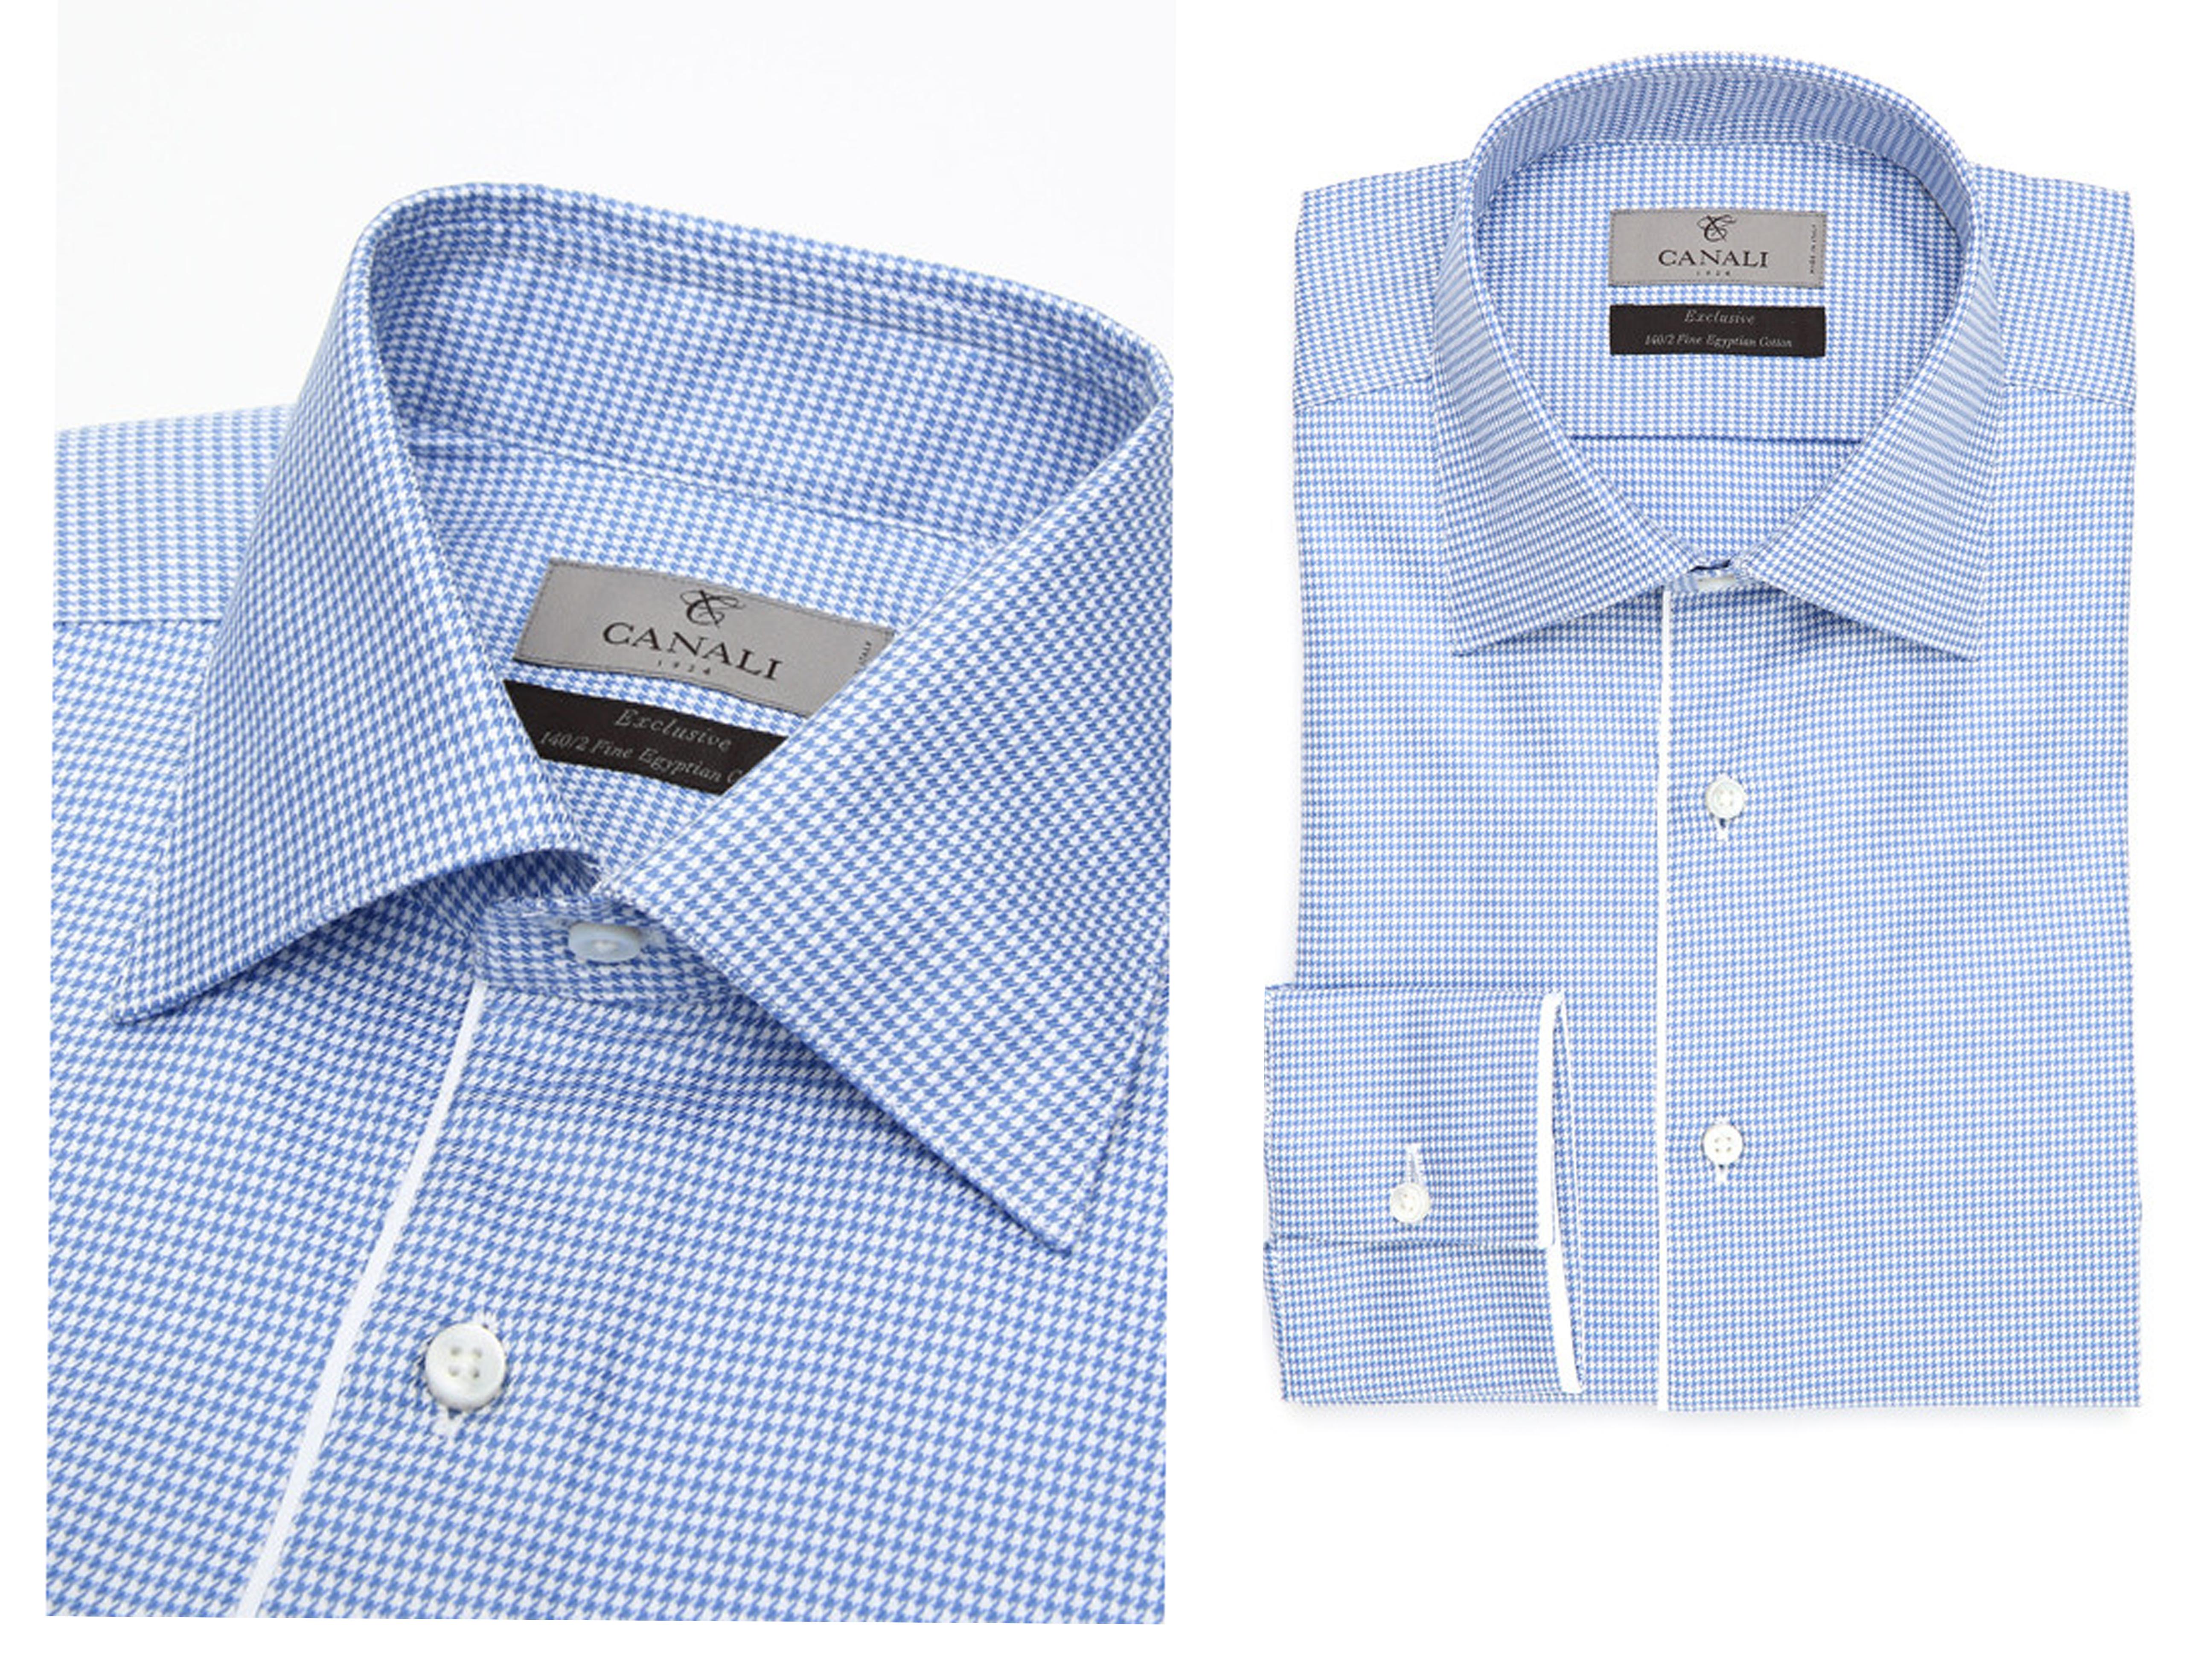 Canali Mens Tailoring shirt